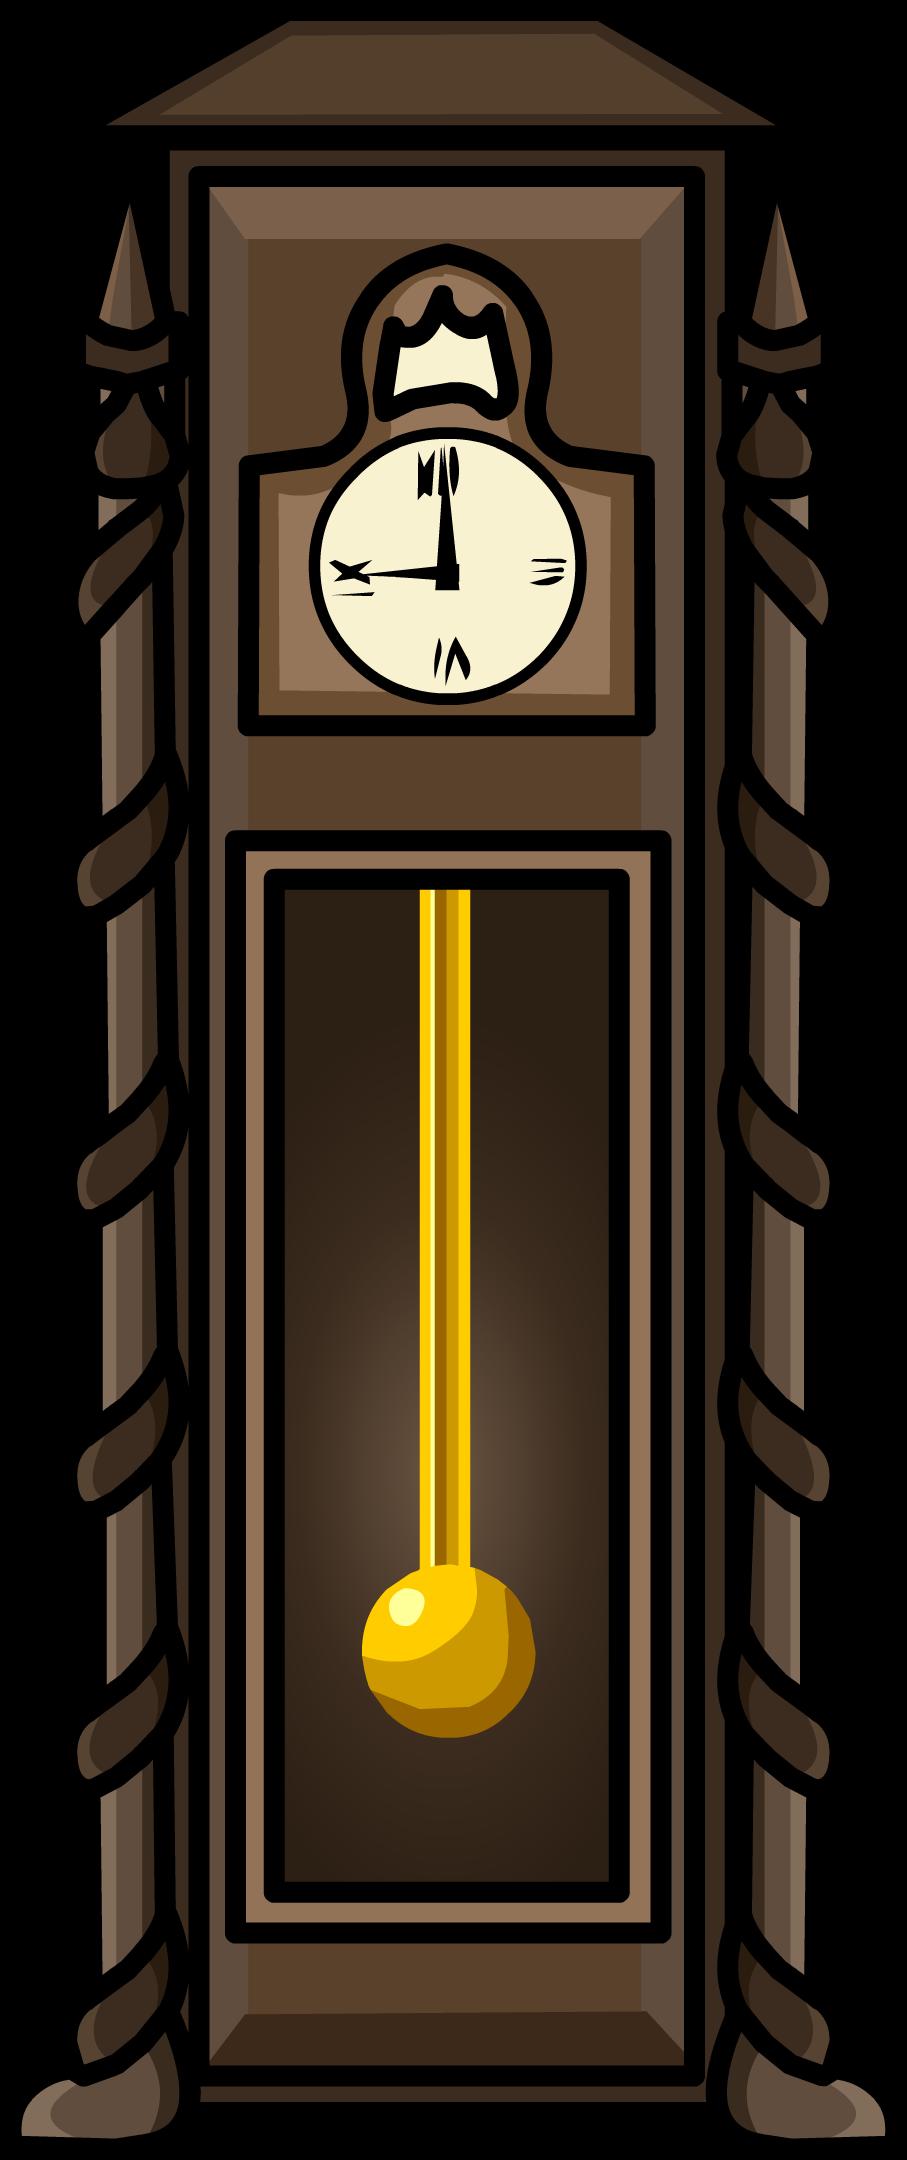 Image antique clock icon. Furniture clipart vintage furniture